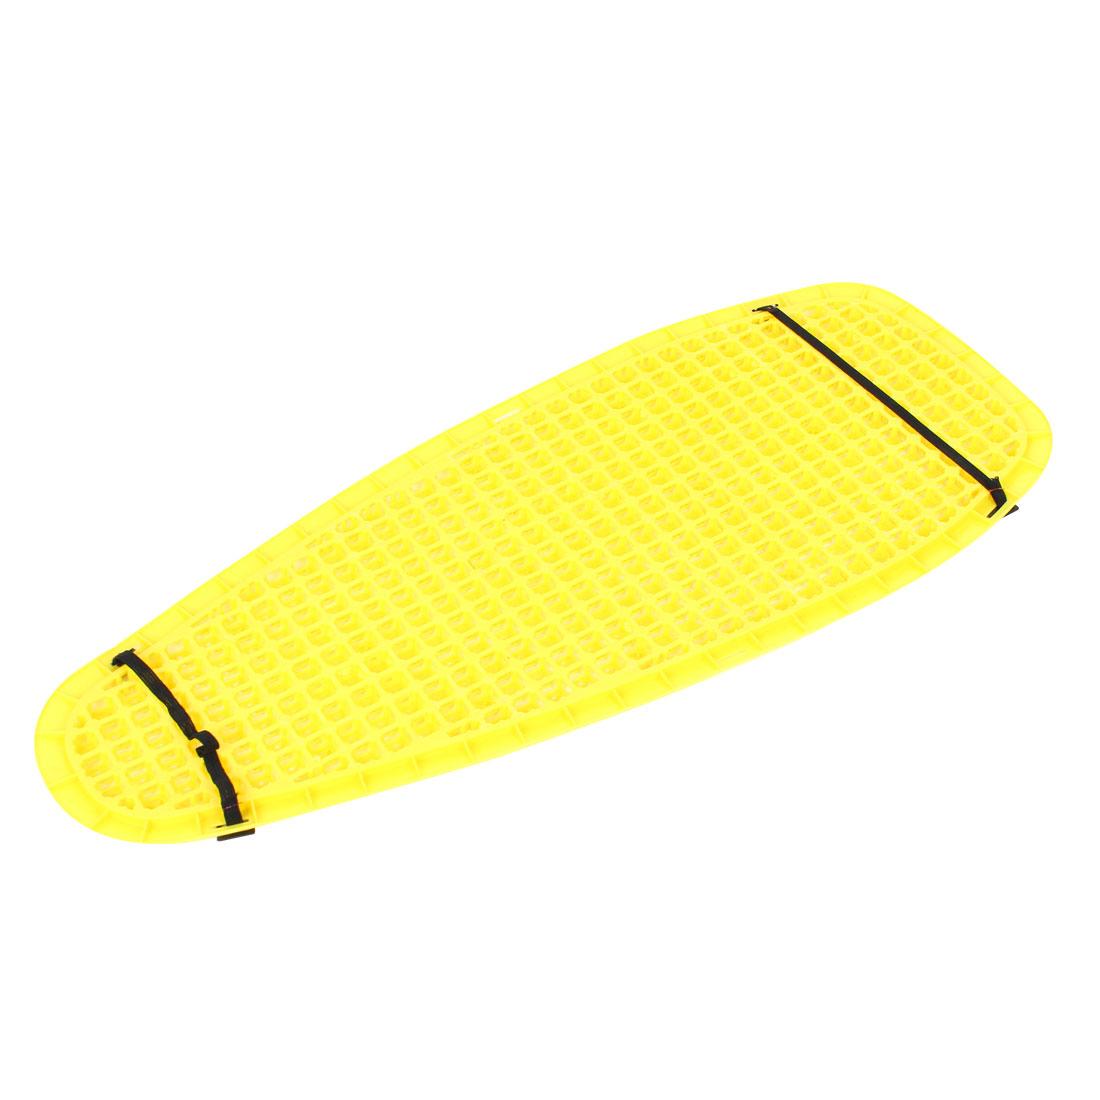 Motorcycle Motorbike Sunscreen Yellow Plastic Bulge Type Seat Cushion